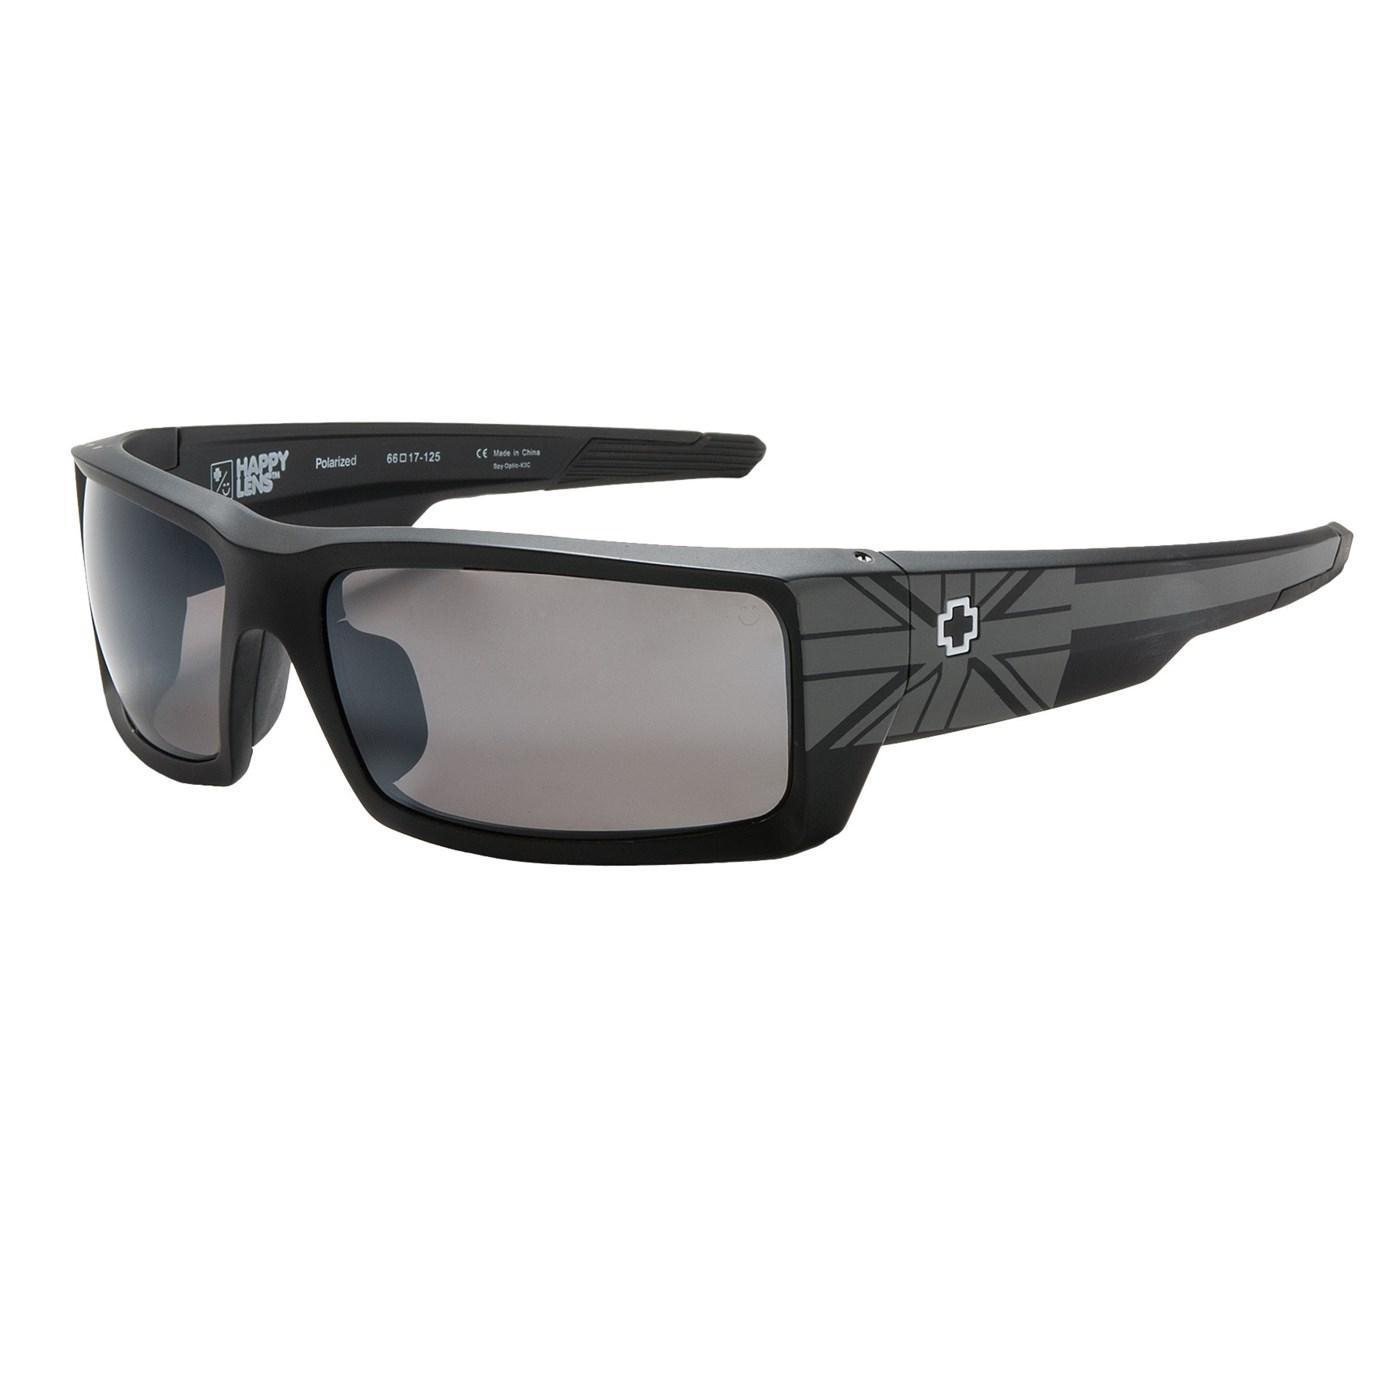 6b705e7ccc5ac Spy Optics General Hawaii Sunglasses (For Men and Women) 9693H 64 on ...